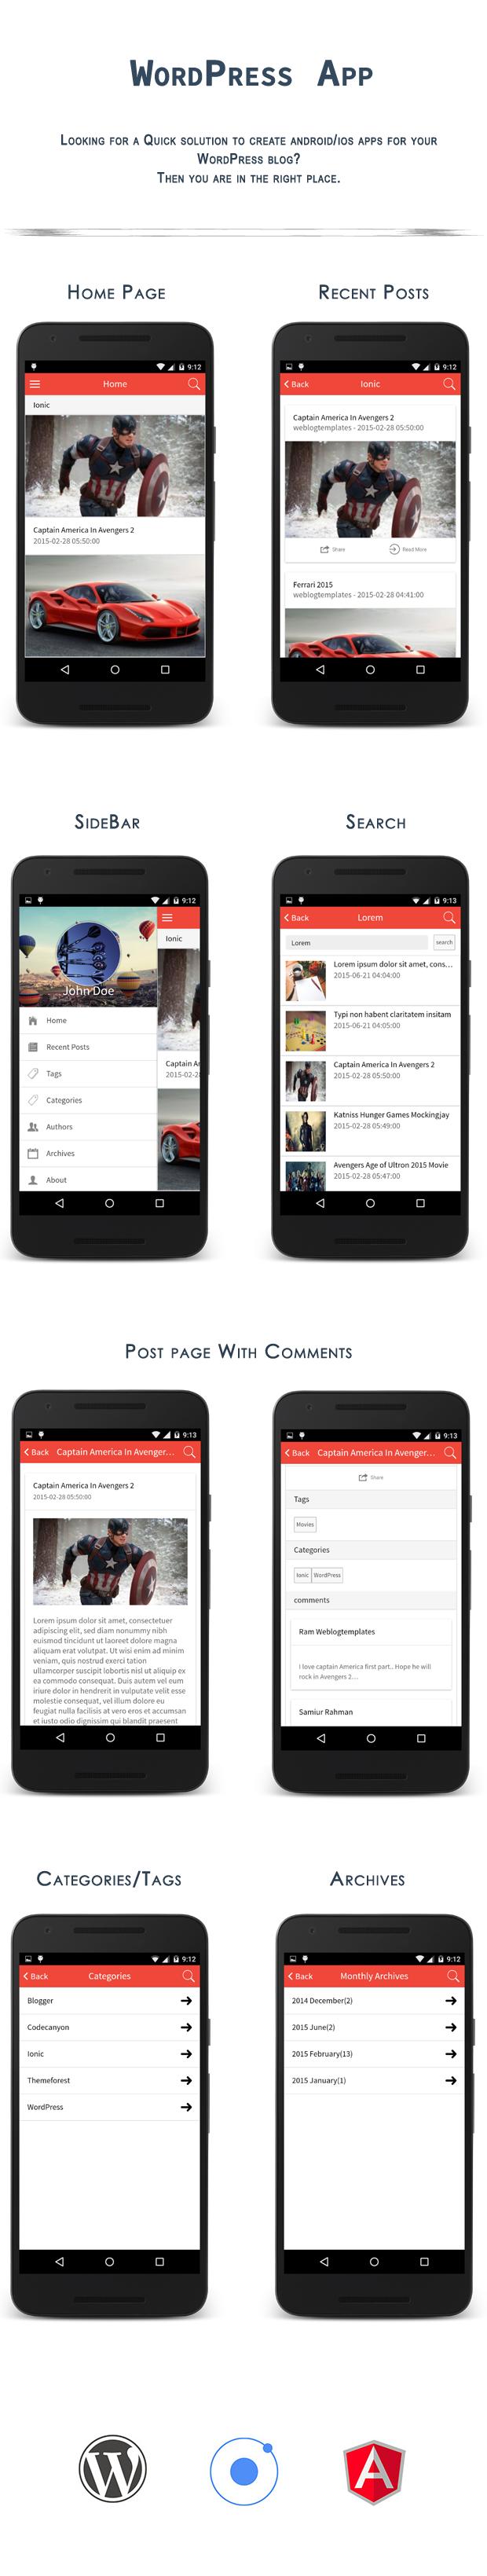 IonWp - Ionic Phonegap/Cordova WordPress App - 1